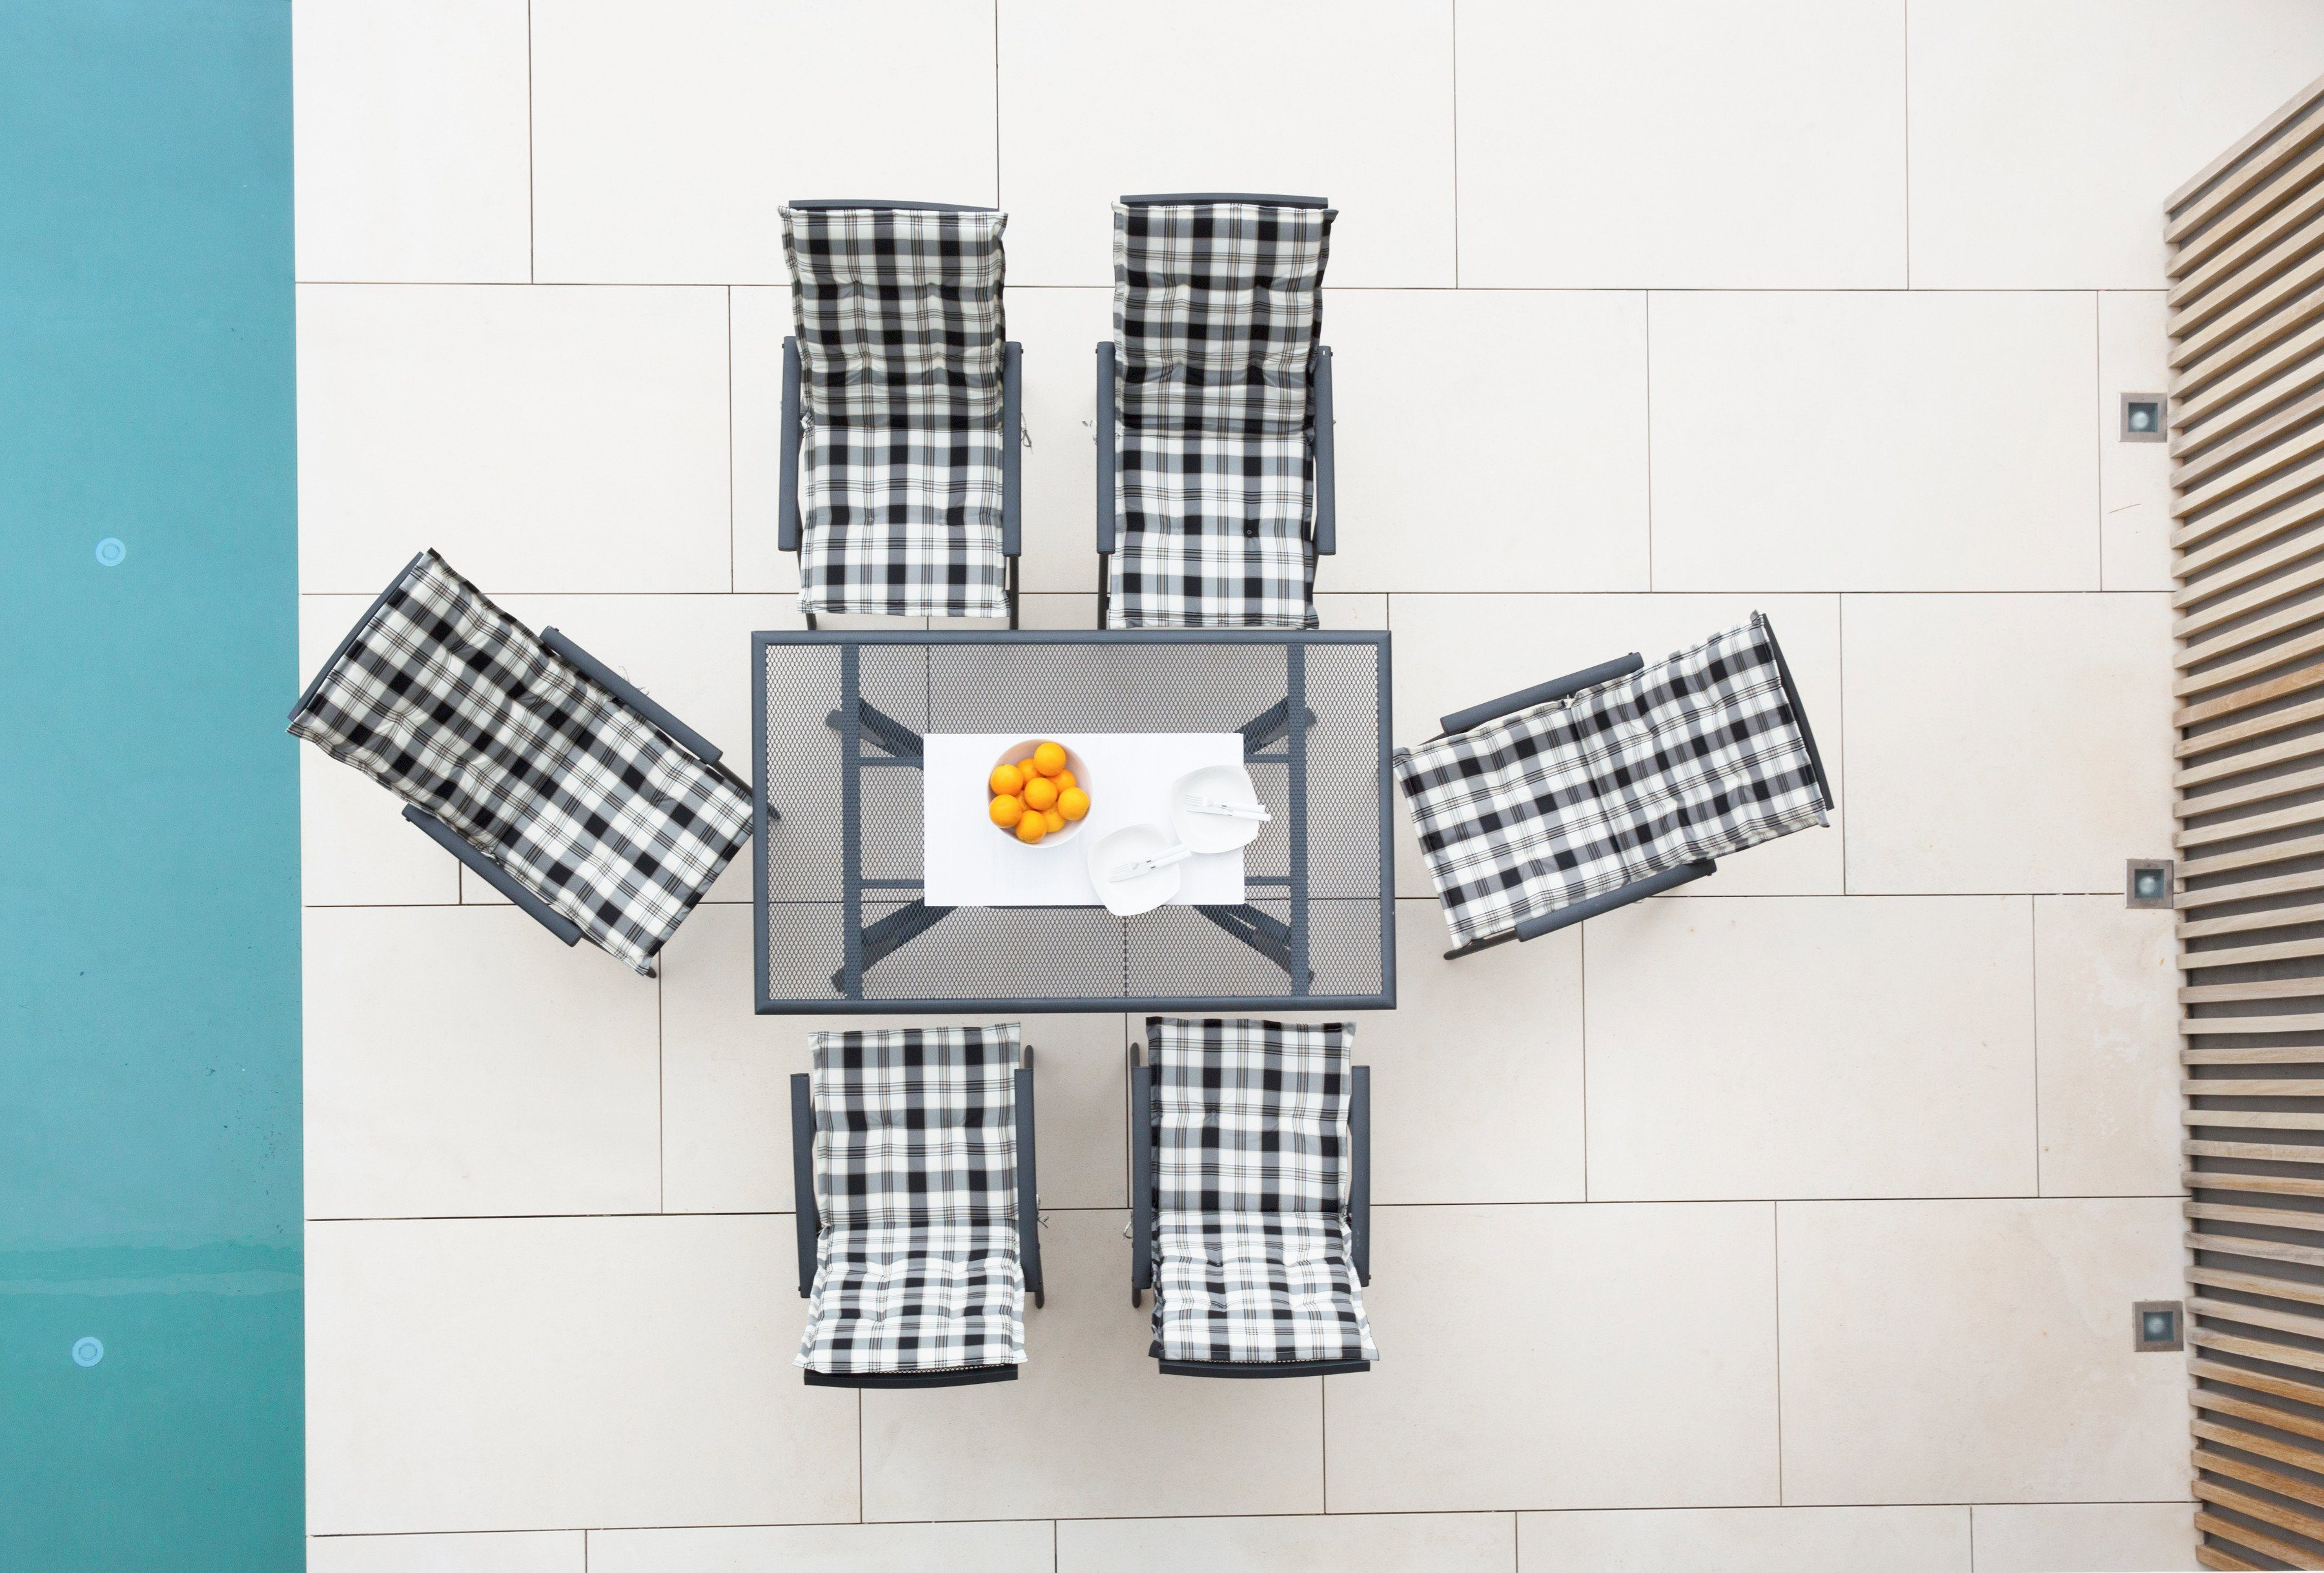 13-tlg. Gartenmöbelset »Montreal«, 6 Klappsessel, Tisch 150x90 cm, Alu, anthrazit